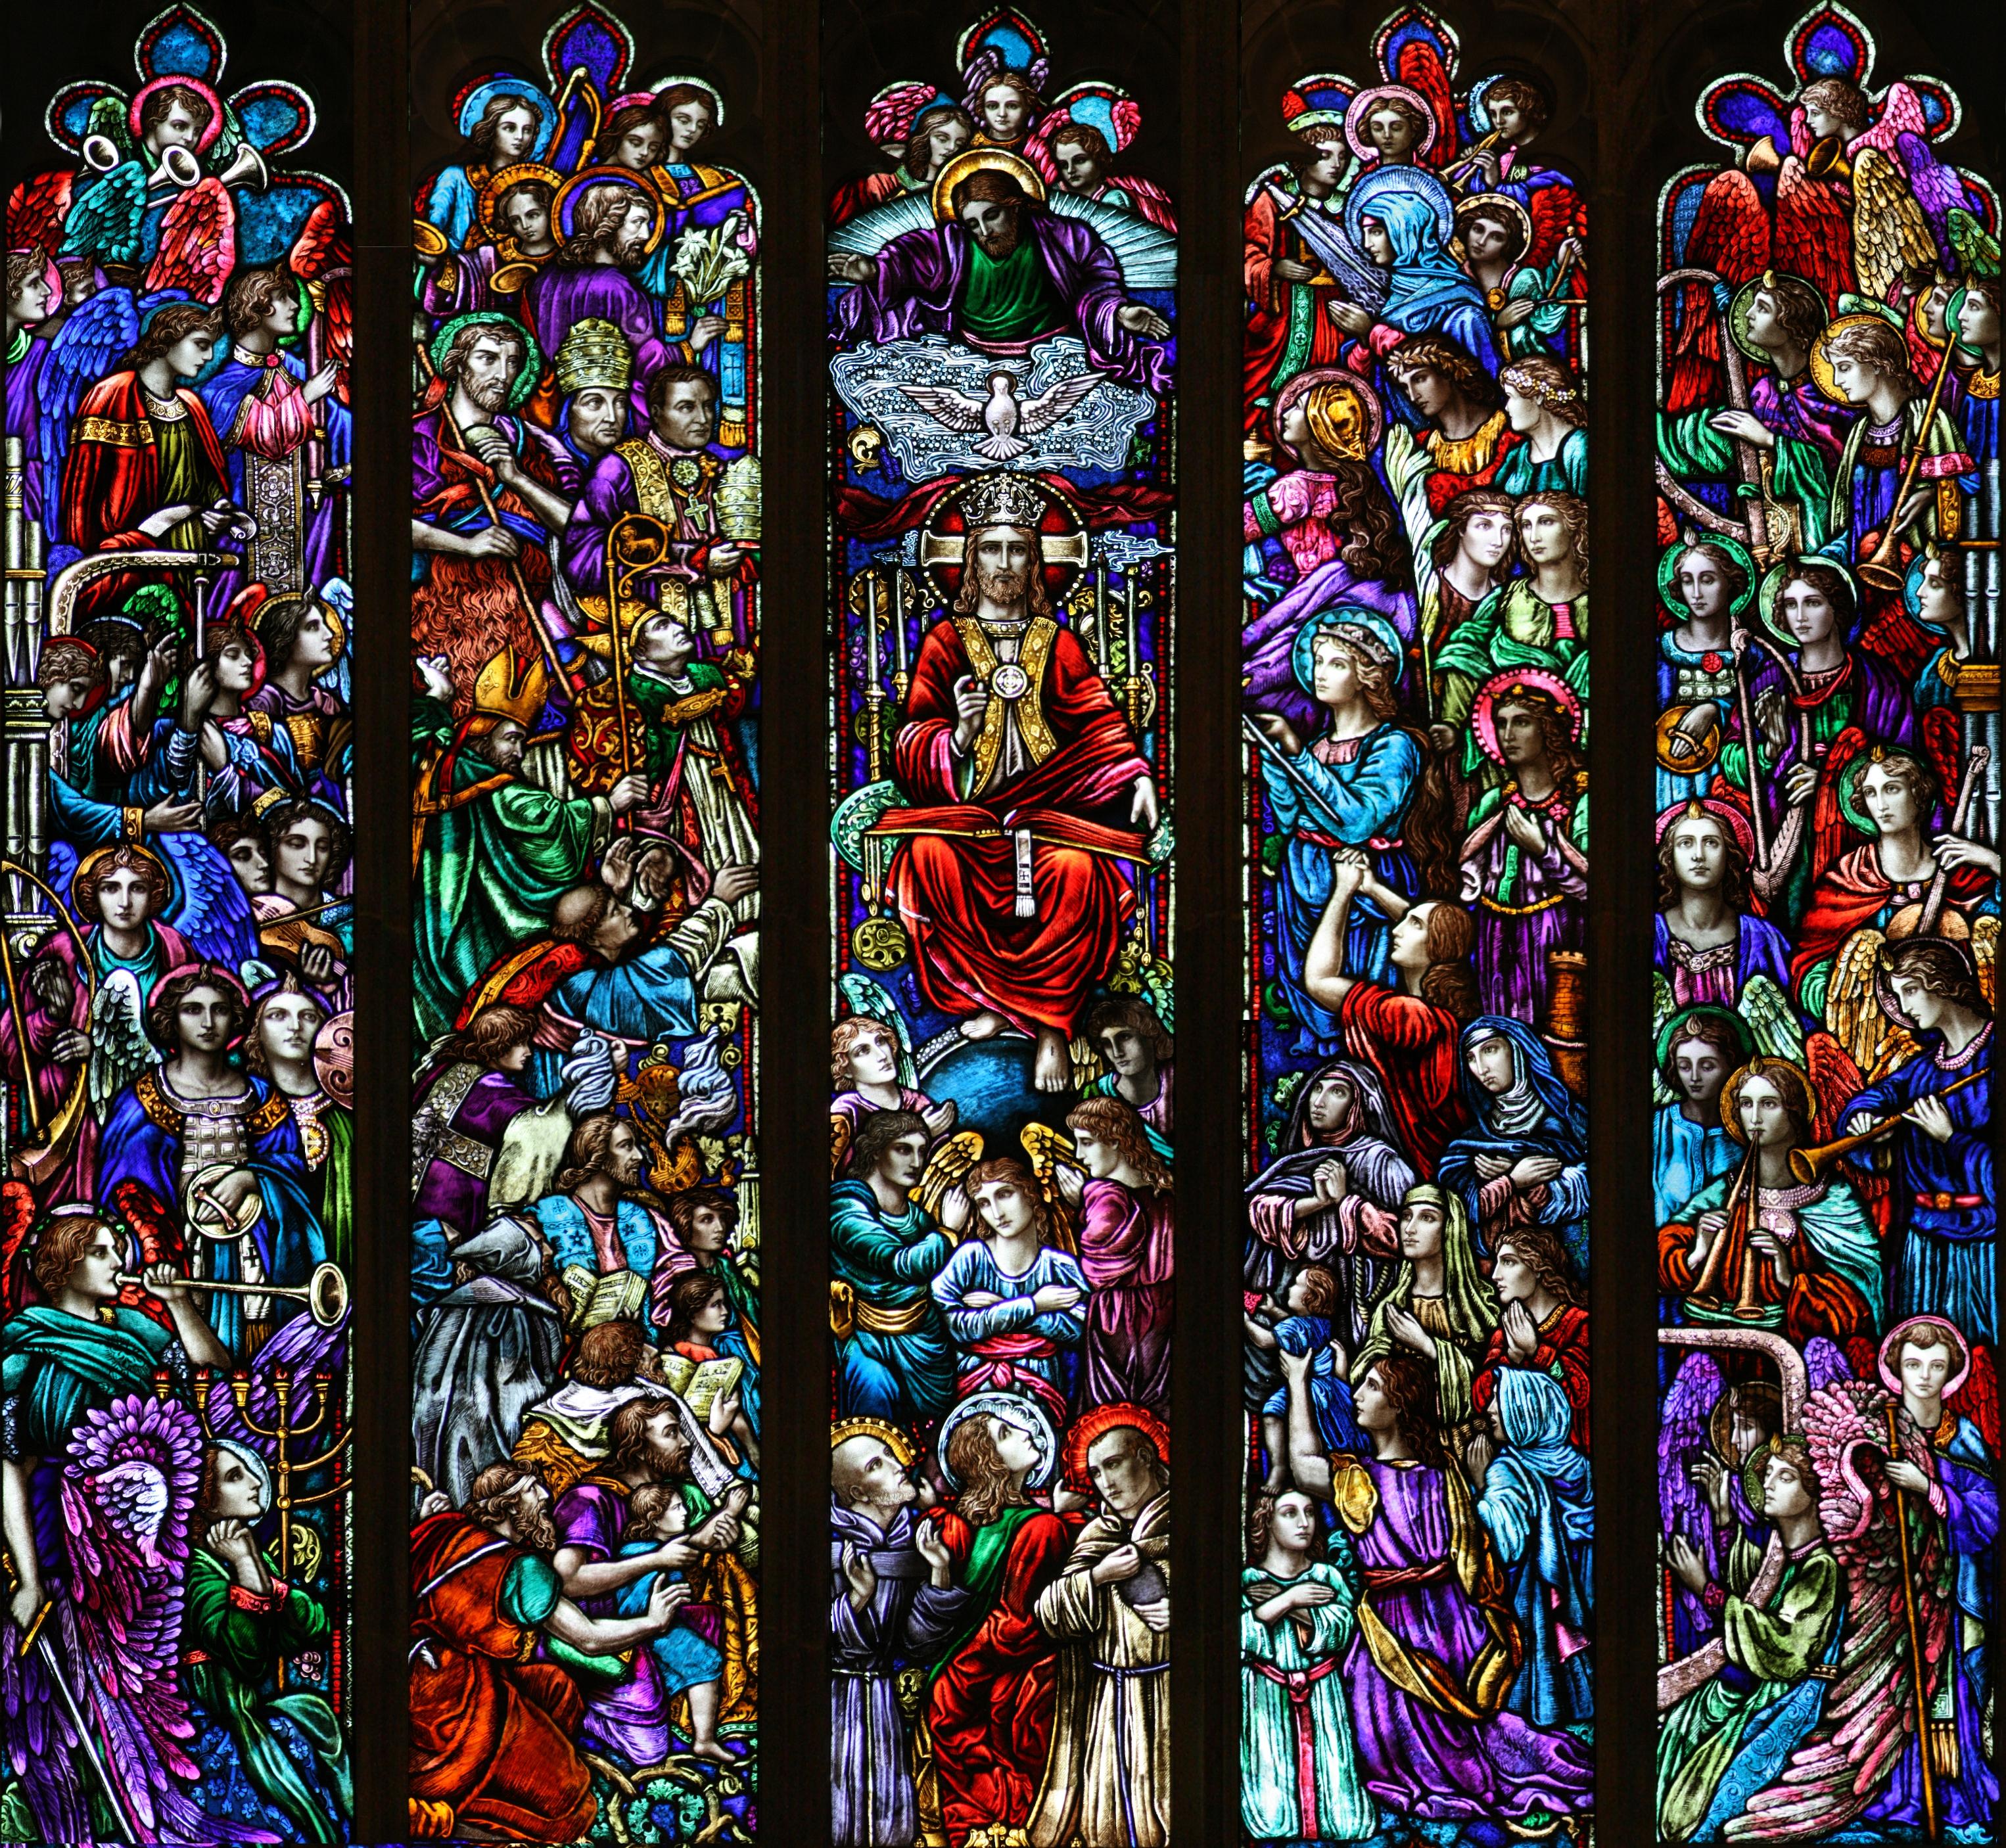 filipino catholics celebrate halloween, all saints' & souls' days